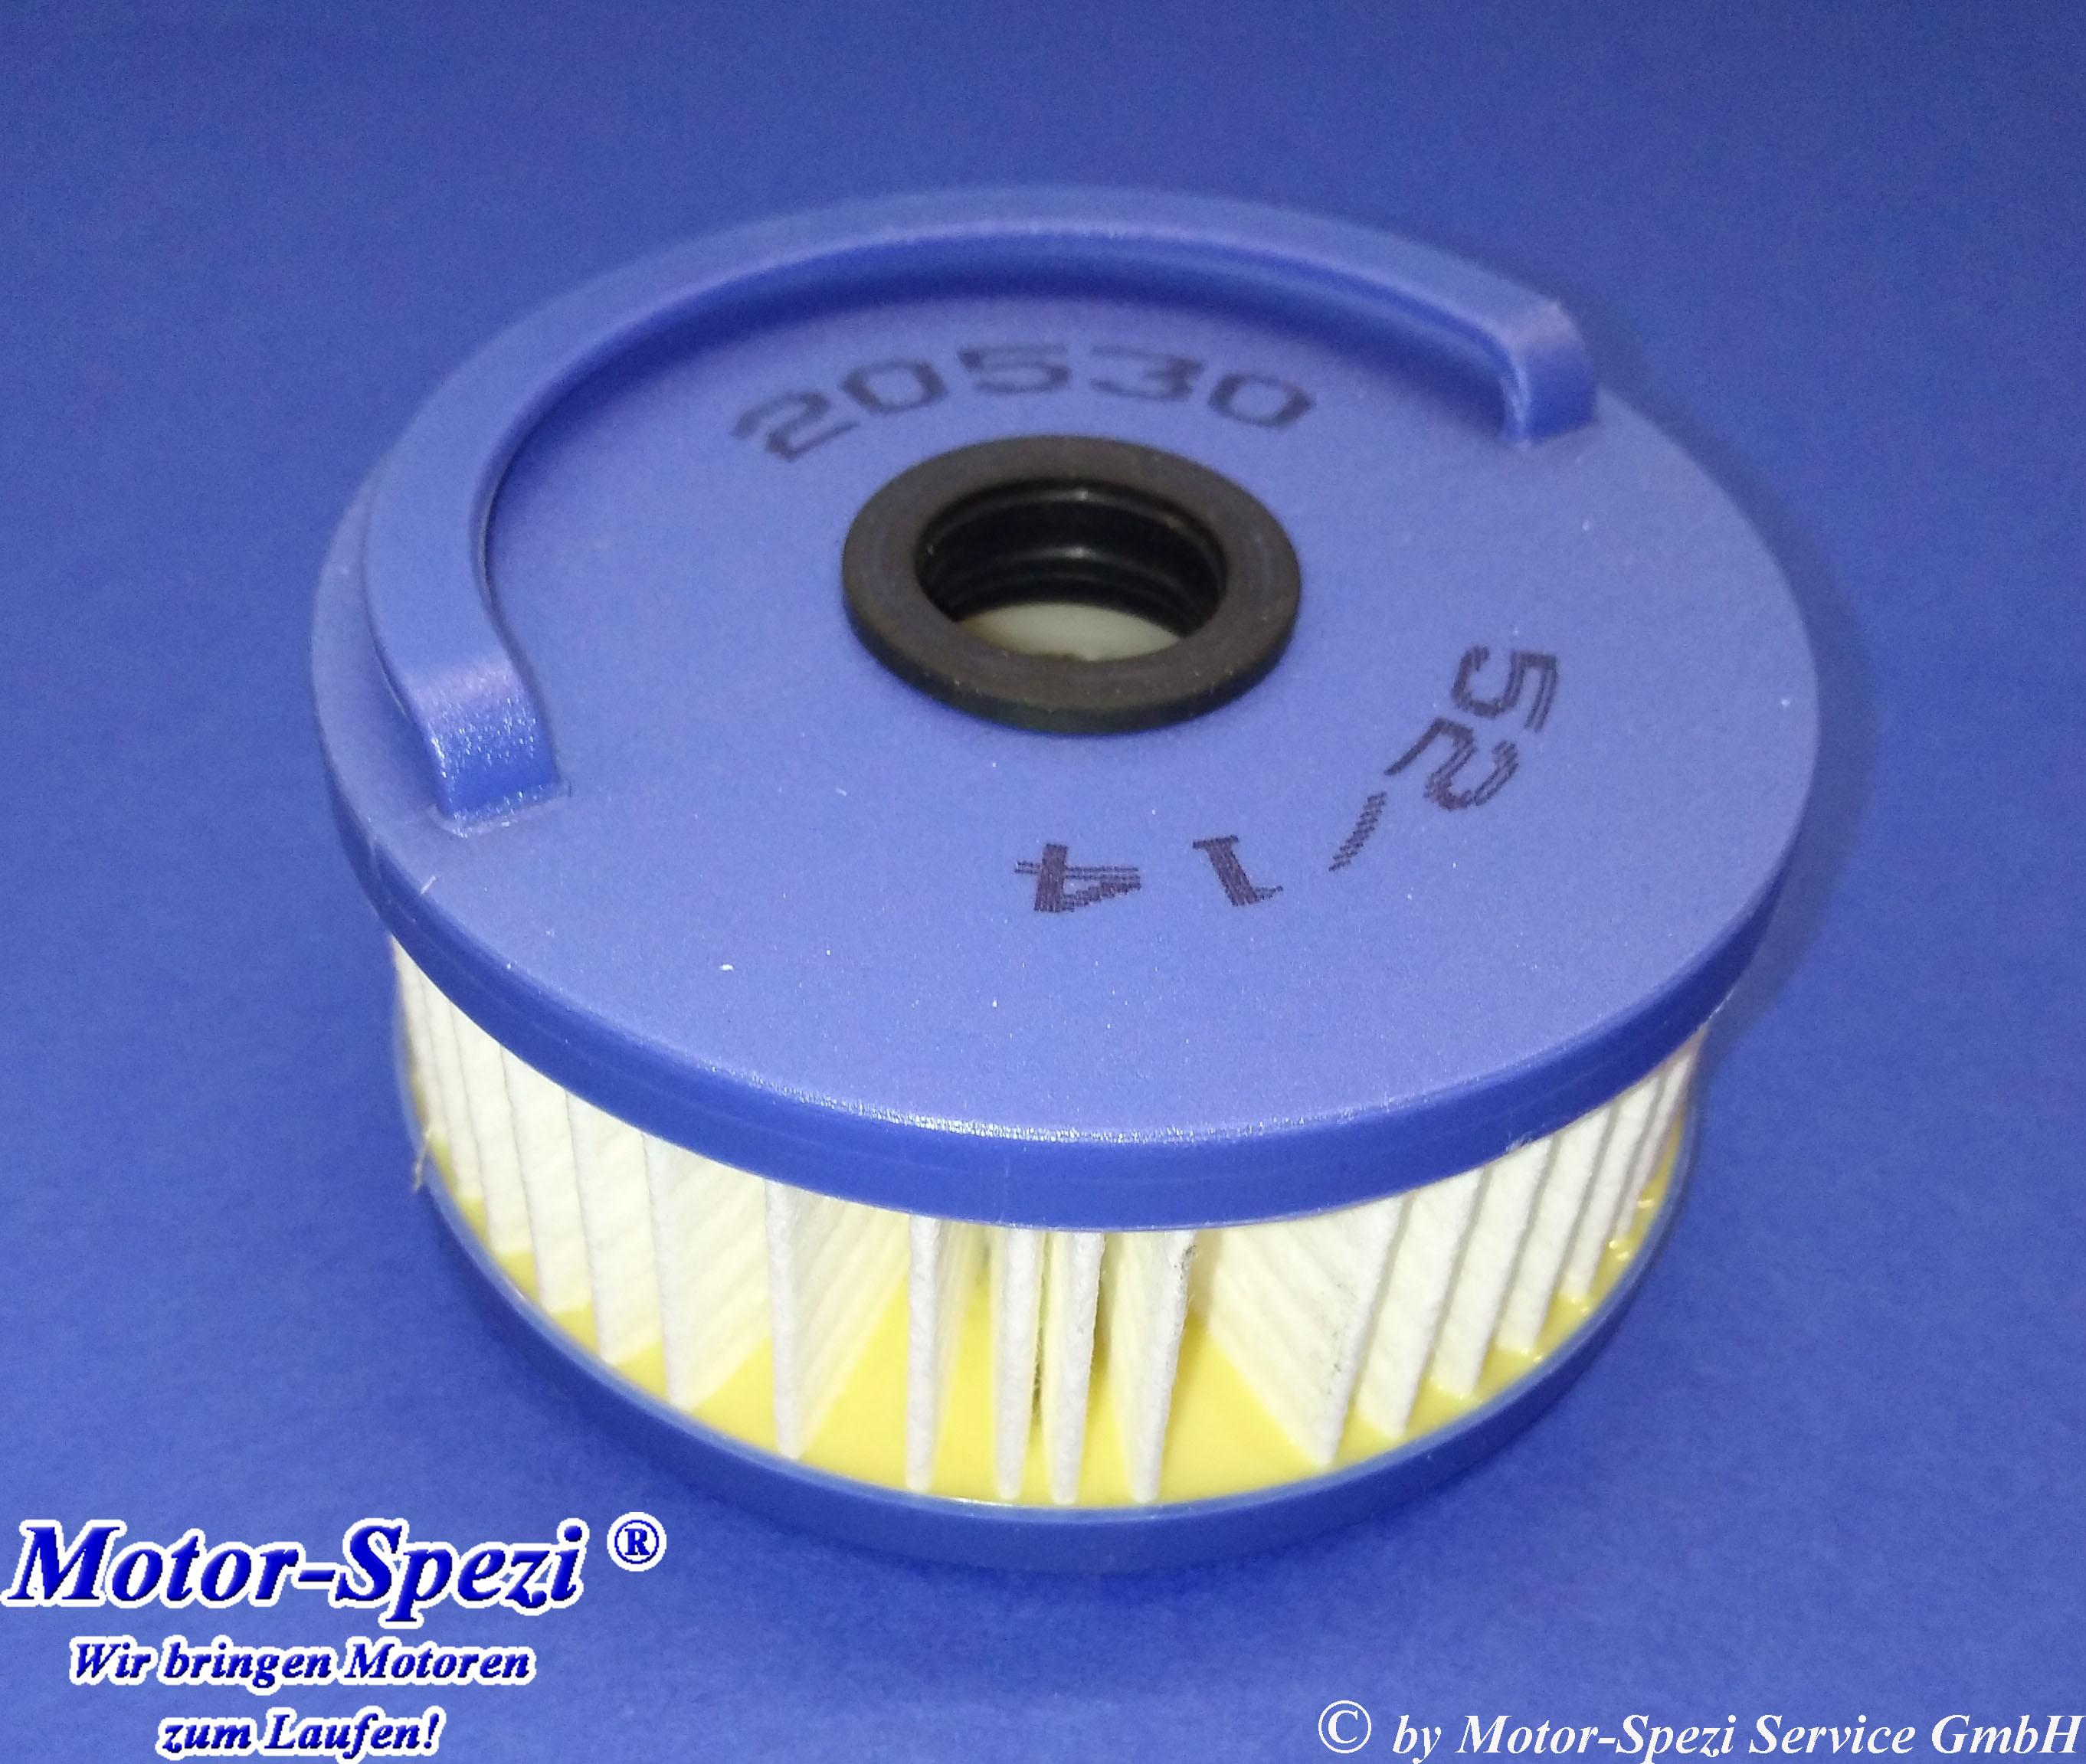 FidgetGear Bremsscheibe hinten Rotor f/ür Honda CBR 600 900 1000 RR VTR1000 2001-2008